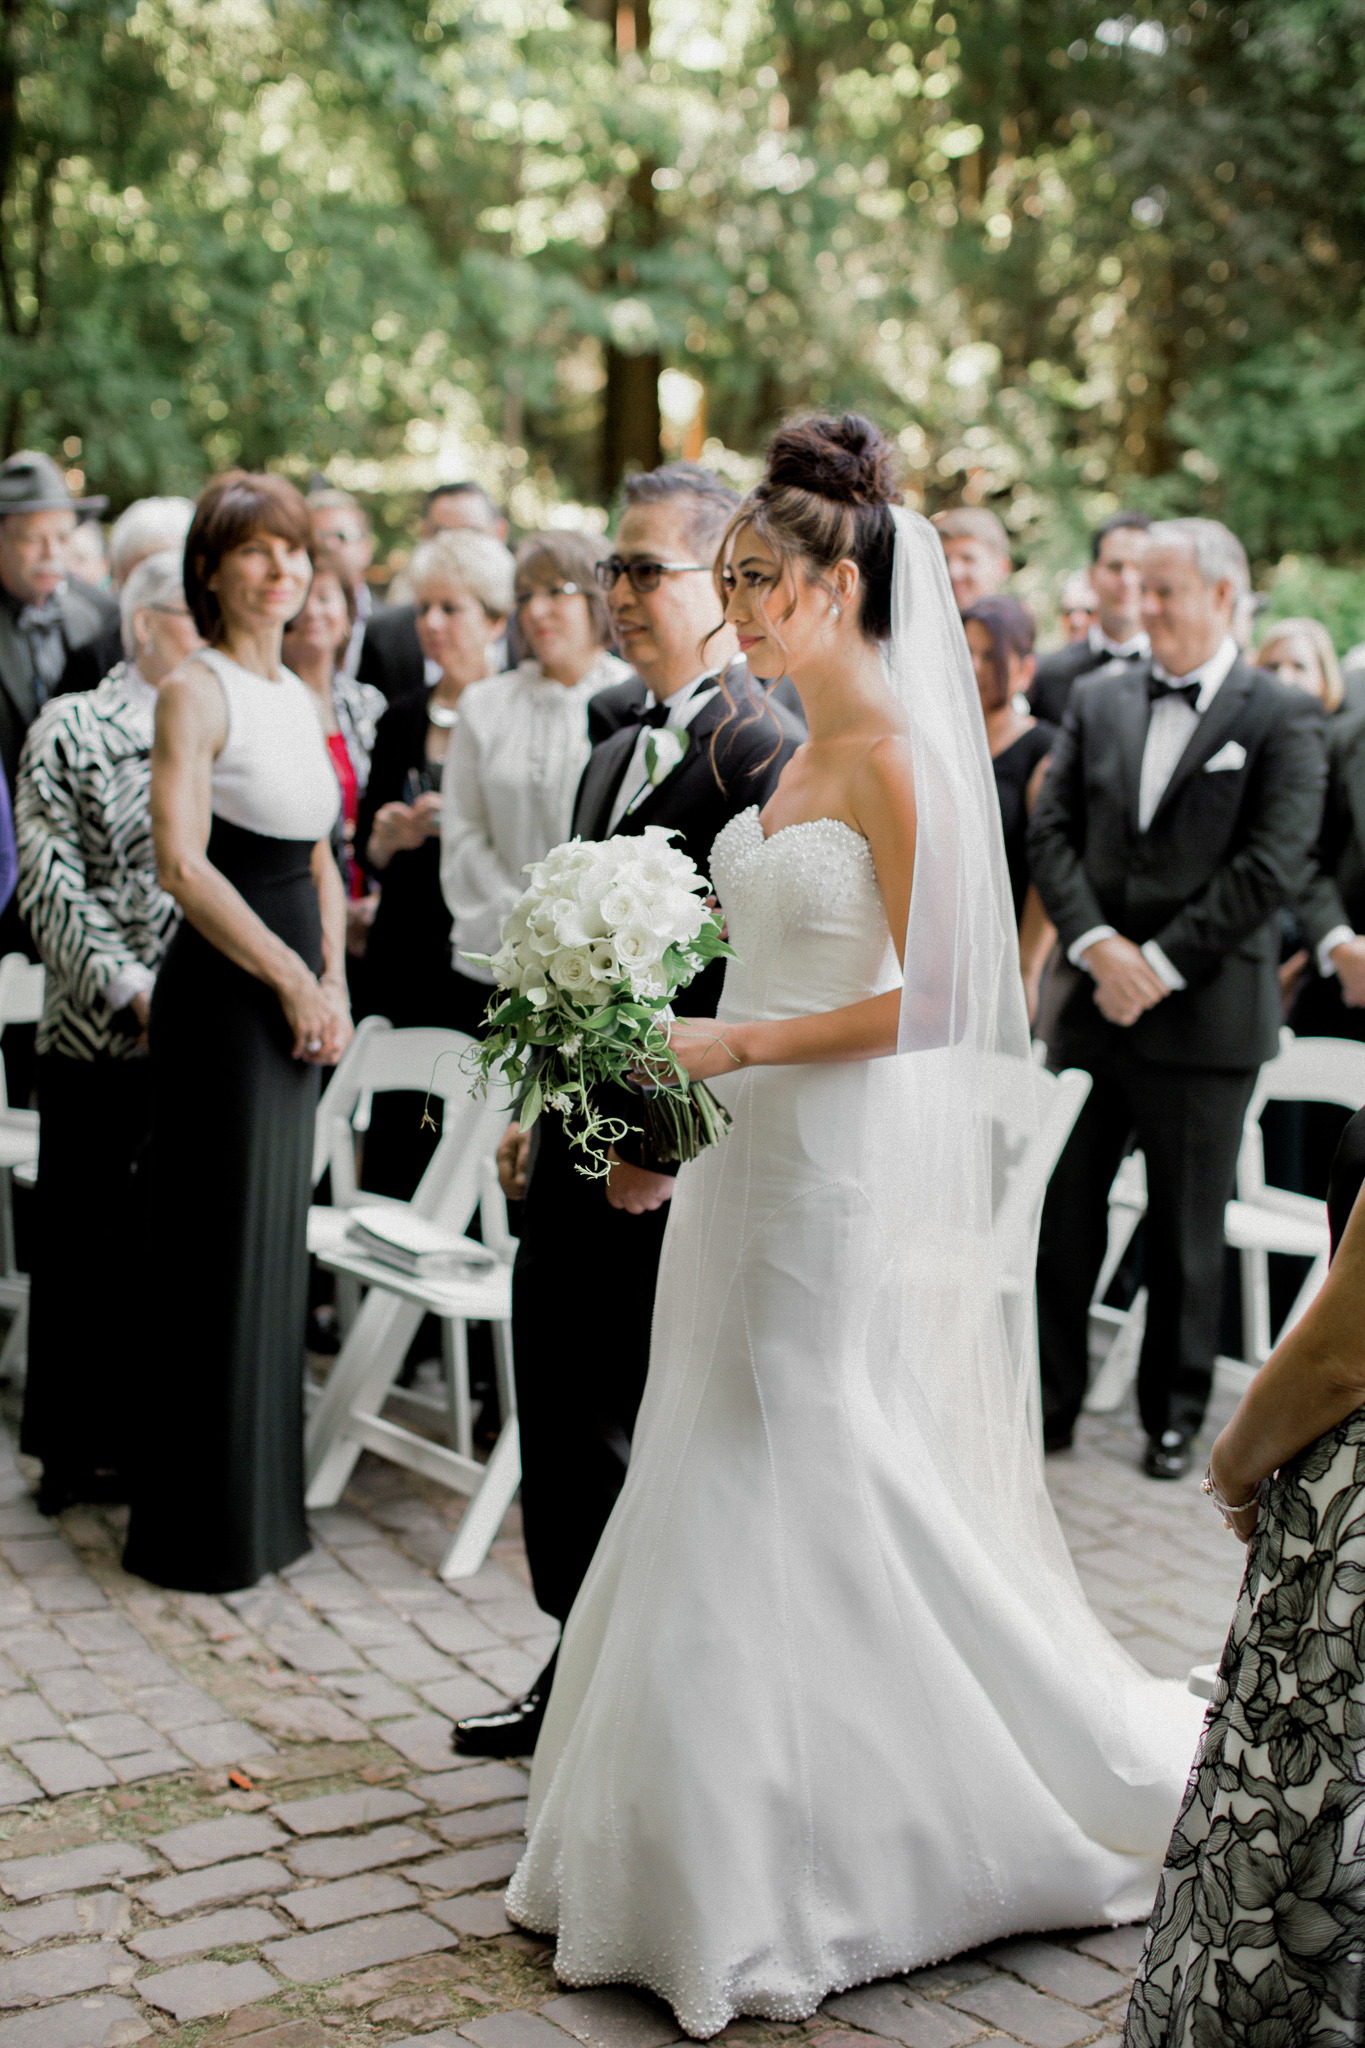 133OutliveCreative_Travel_Photographer_Videographer_Lewis&Clark_Oregon_Elegant_BlackTie_Destination_Wedding.jpg